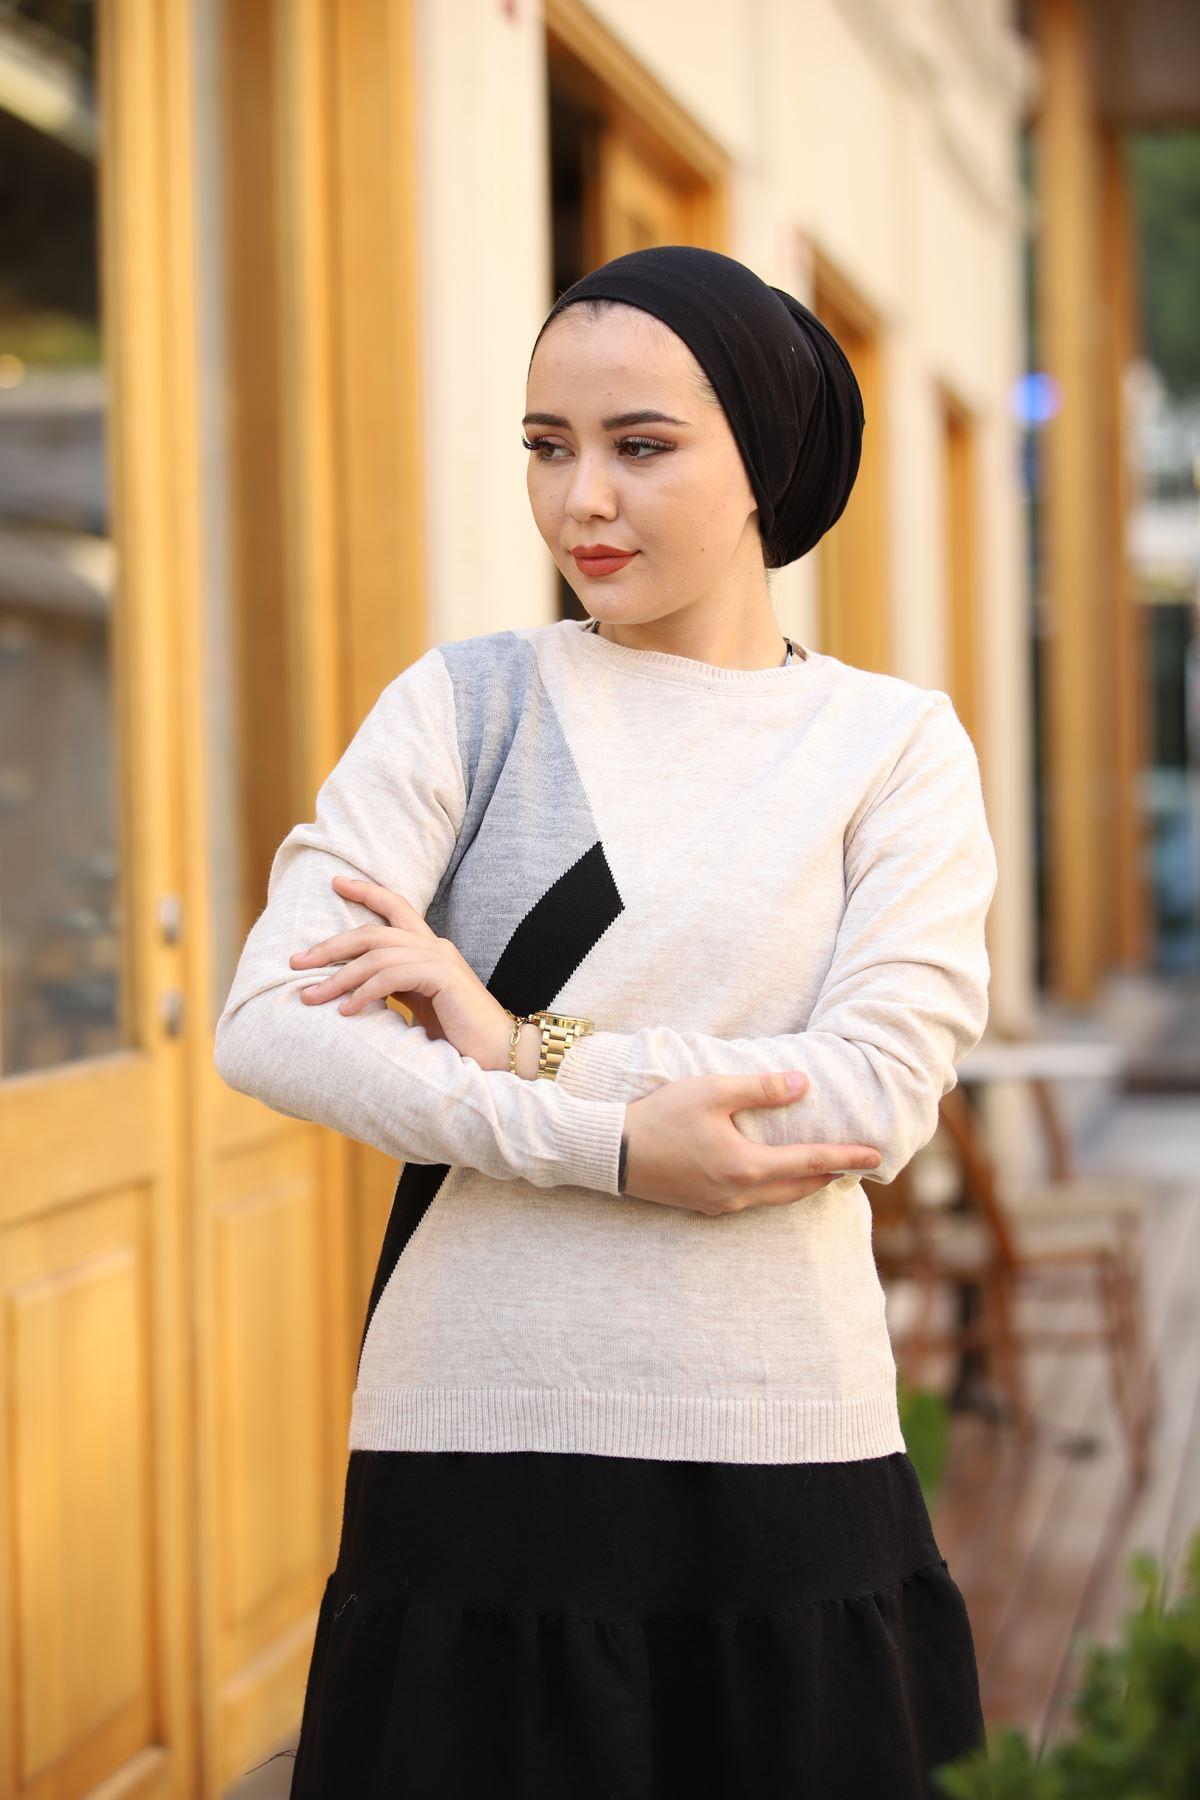 Parçalı Triko Kazak - Taş Rengi